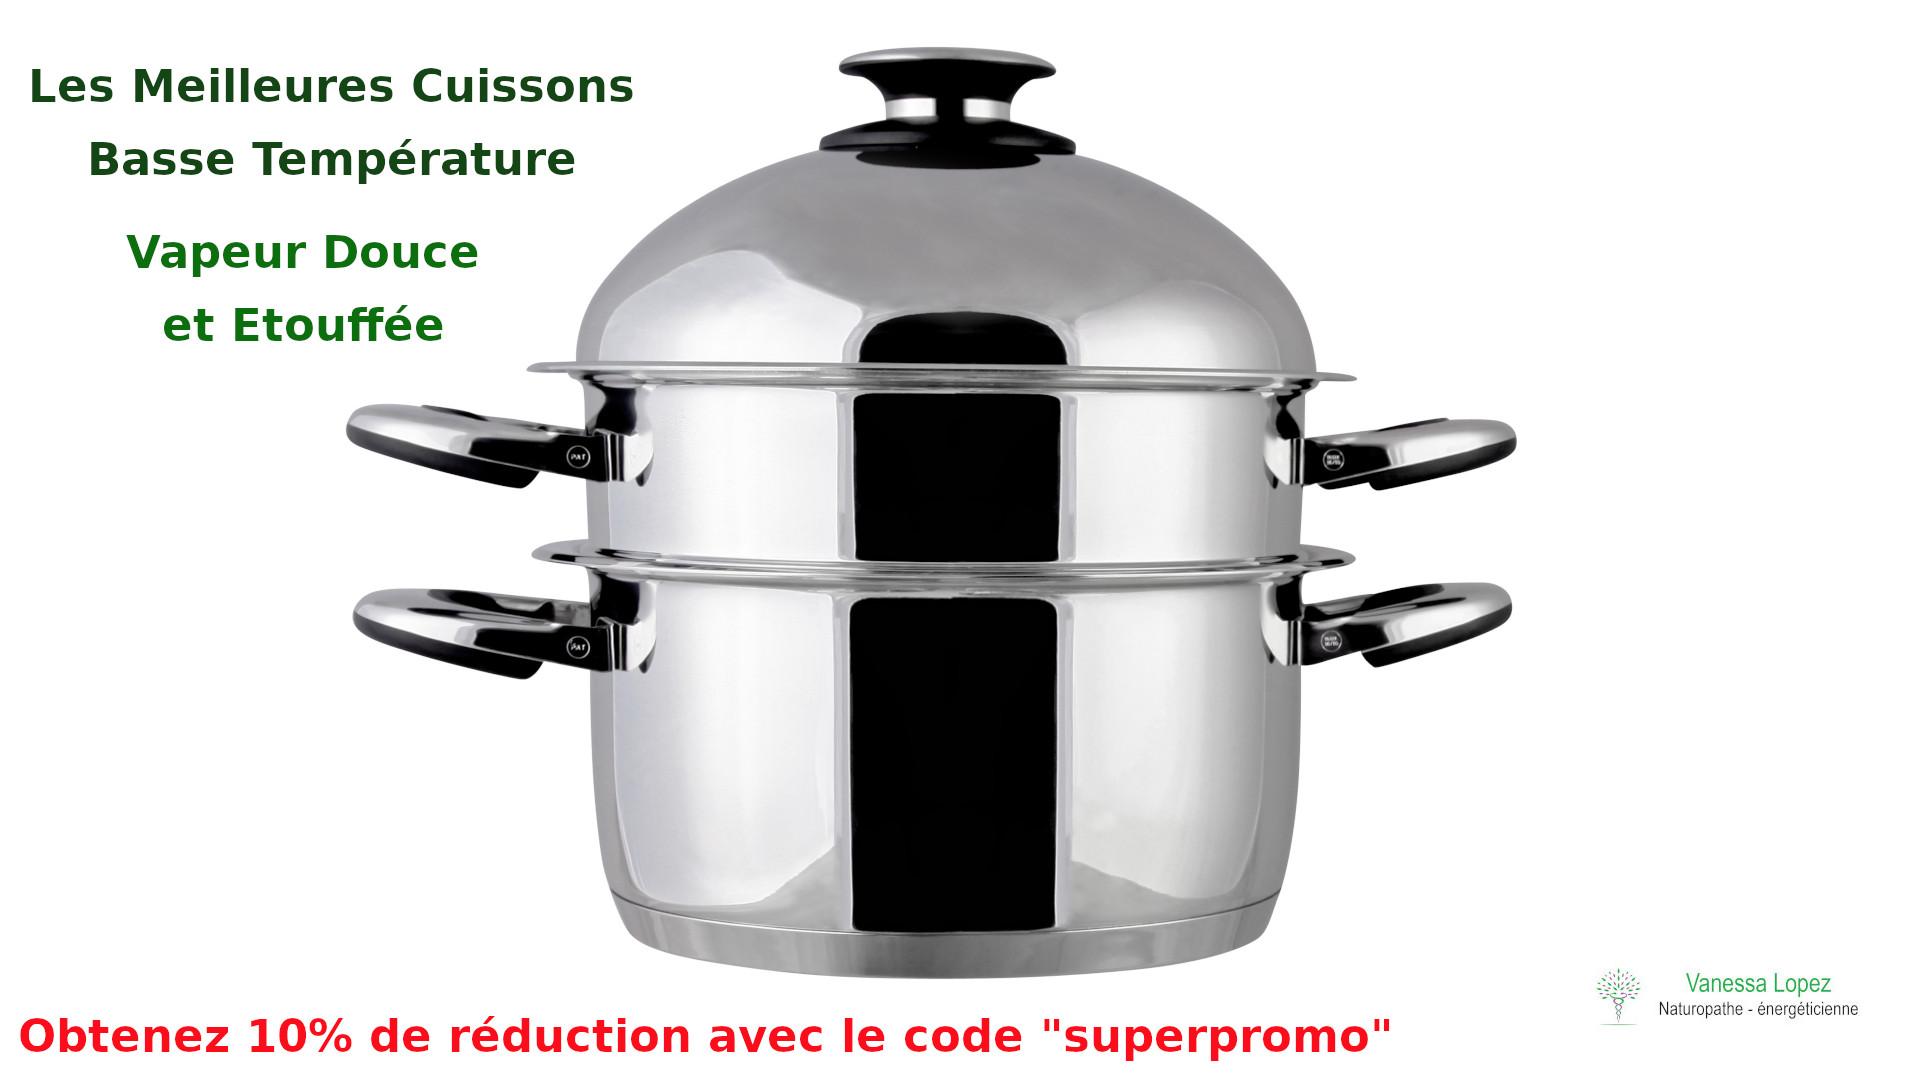 vanessa-lopez-blog-naturopathie-cuisson-basse-temperature-vapeur-douce-etouffee